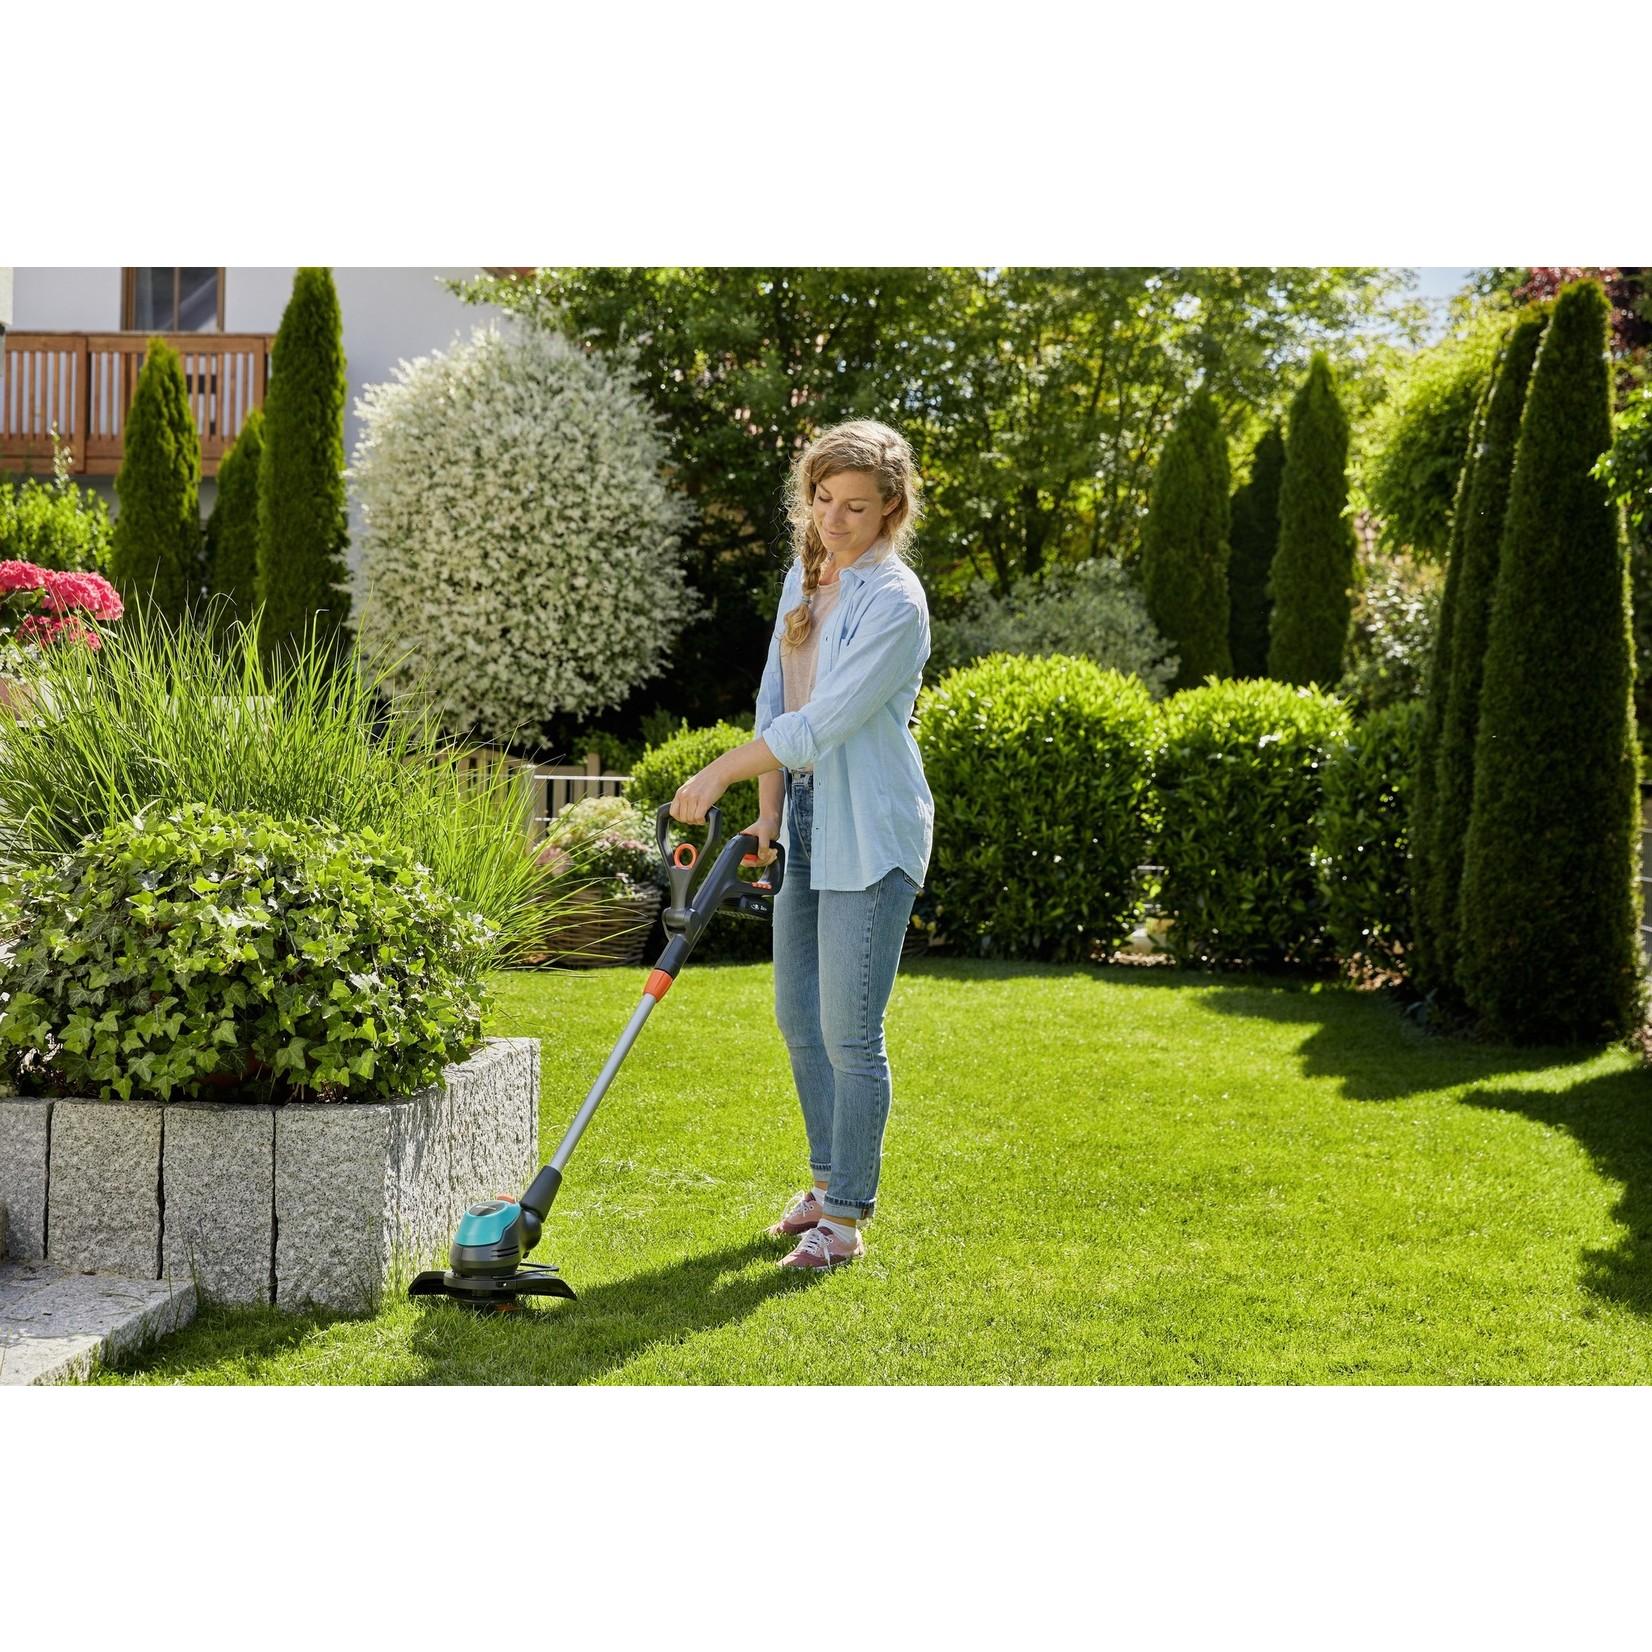 Gardena Gardena Accu trimmer EasyCut 23/18V set